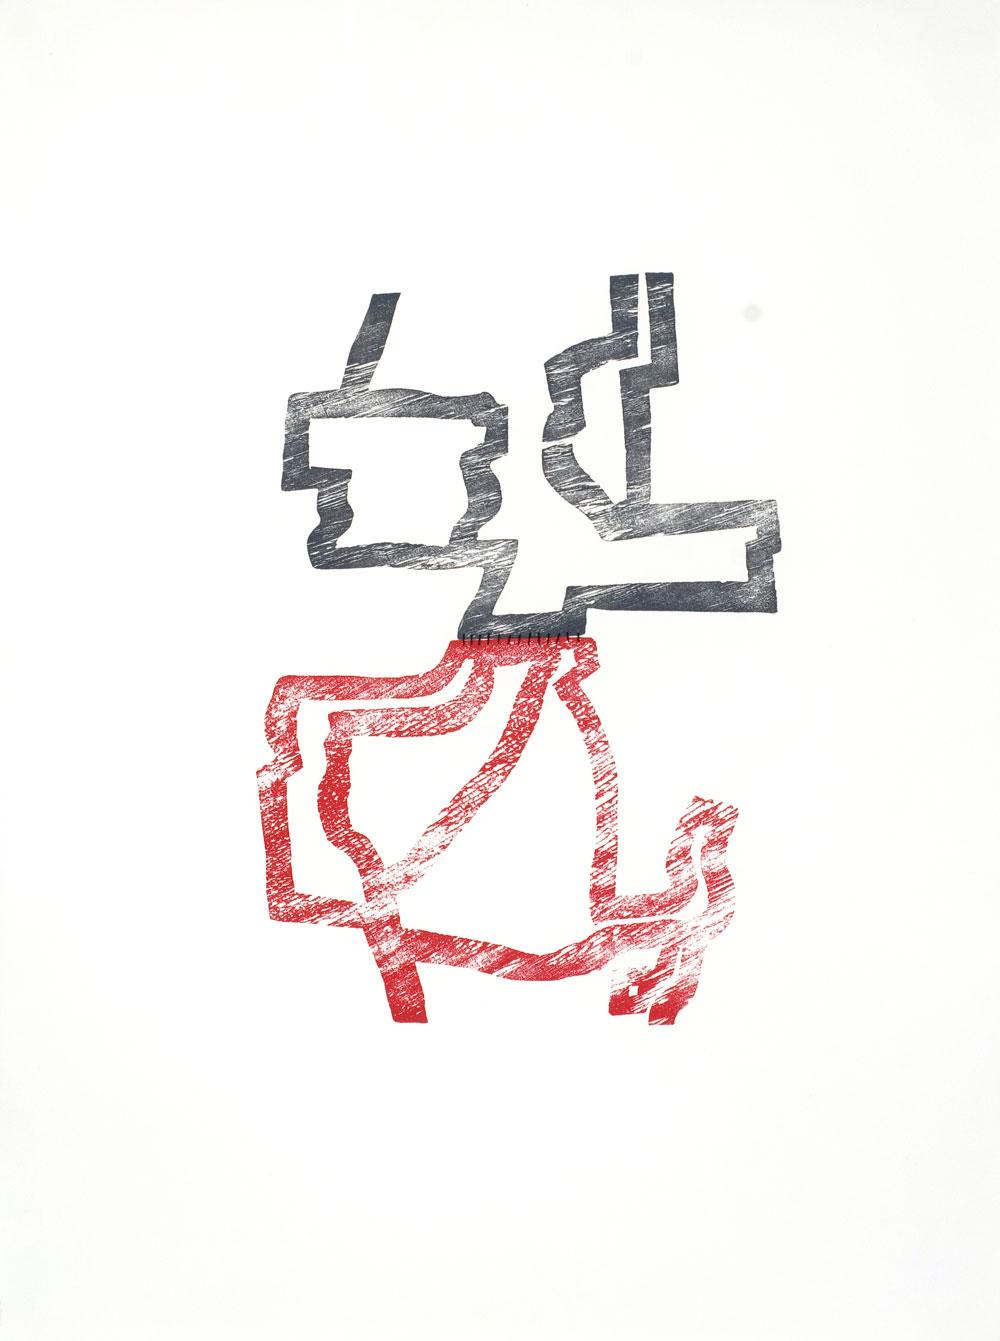 Mark McDean,  A fine balance  , Woodcut, thread, 56 x 76 cm, 2006